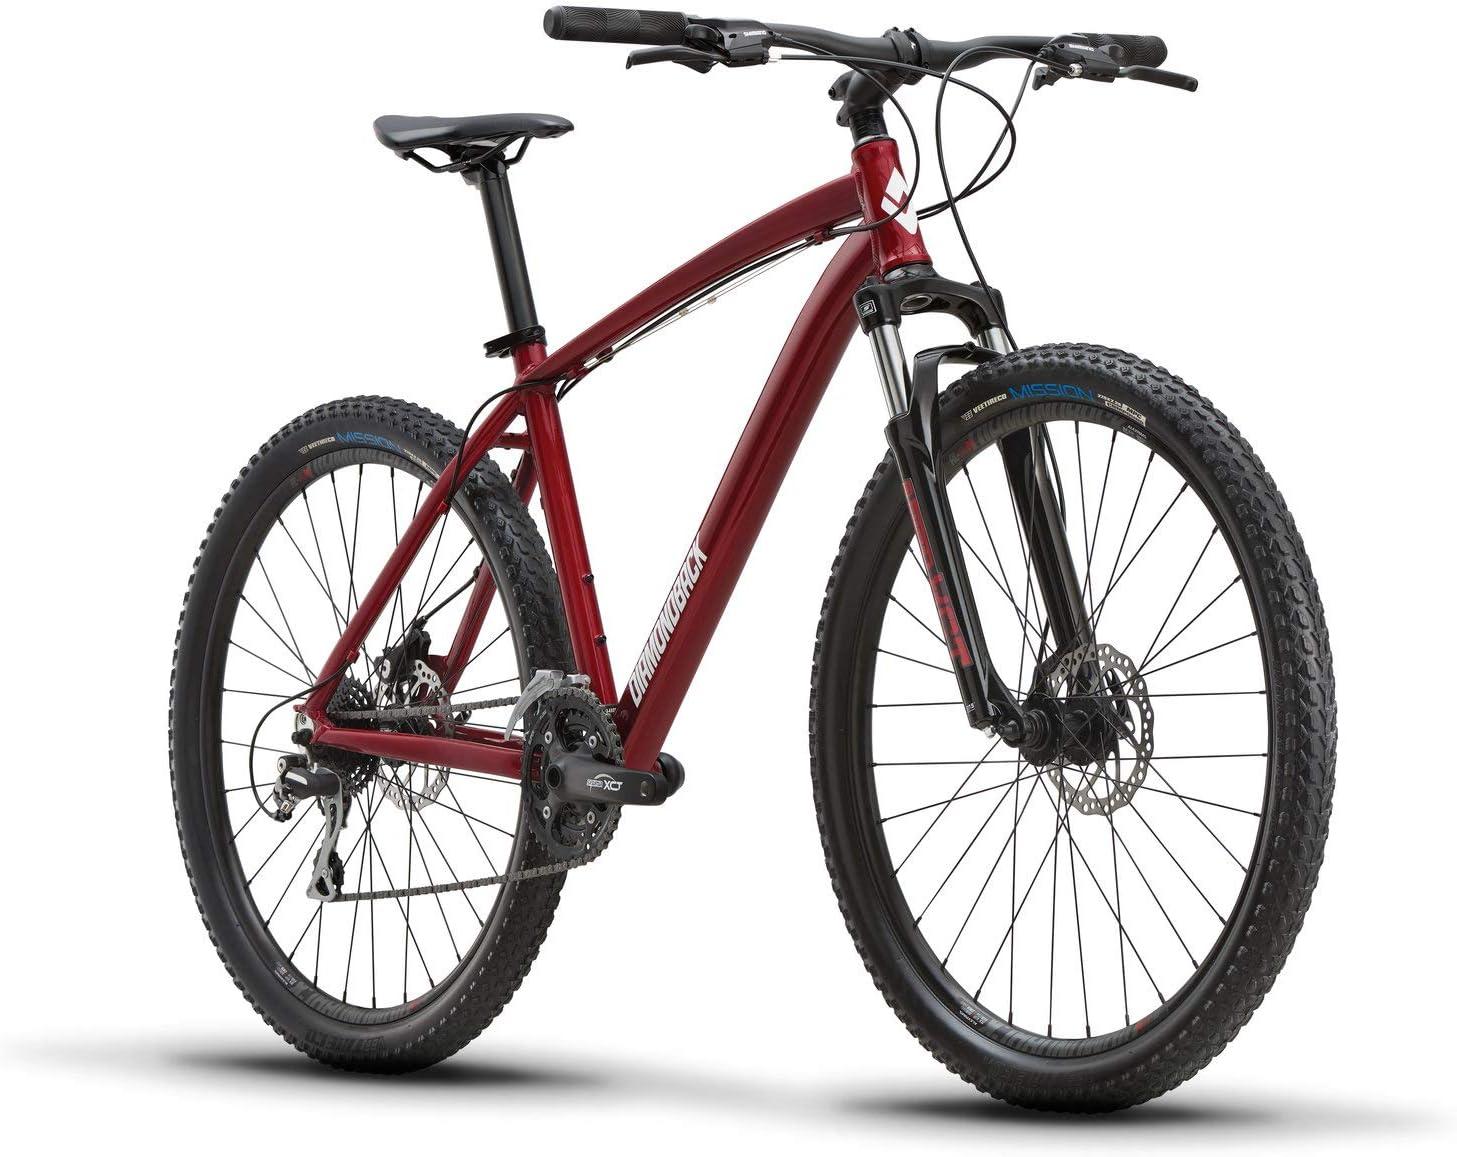 Diamondback Bicycles Overdrive 27.5 Hardtail Mountain Bike